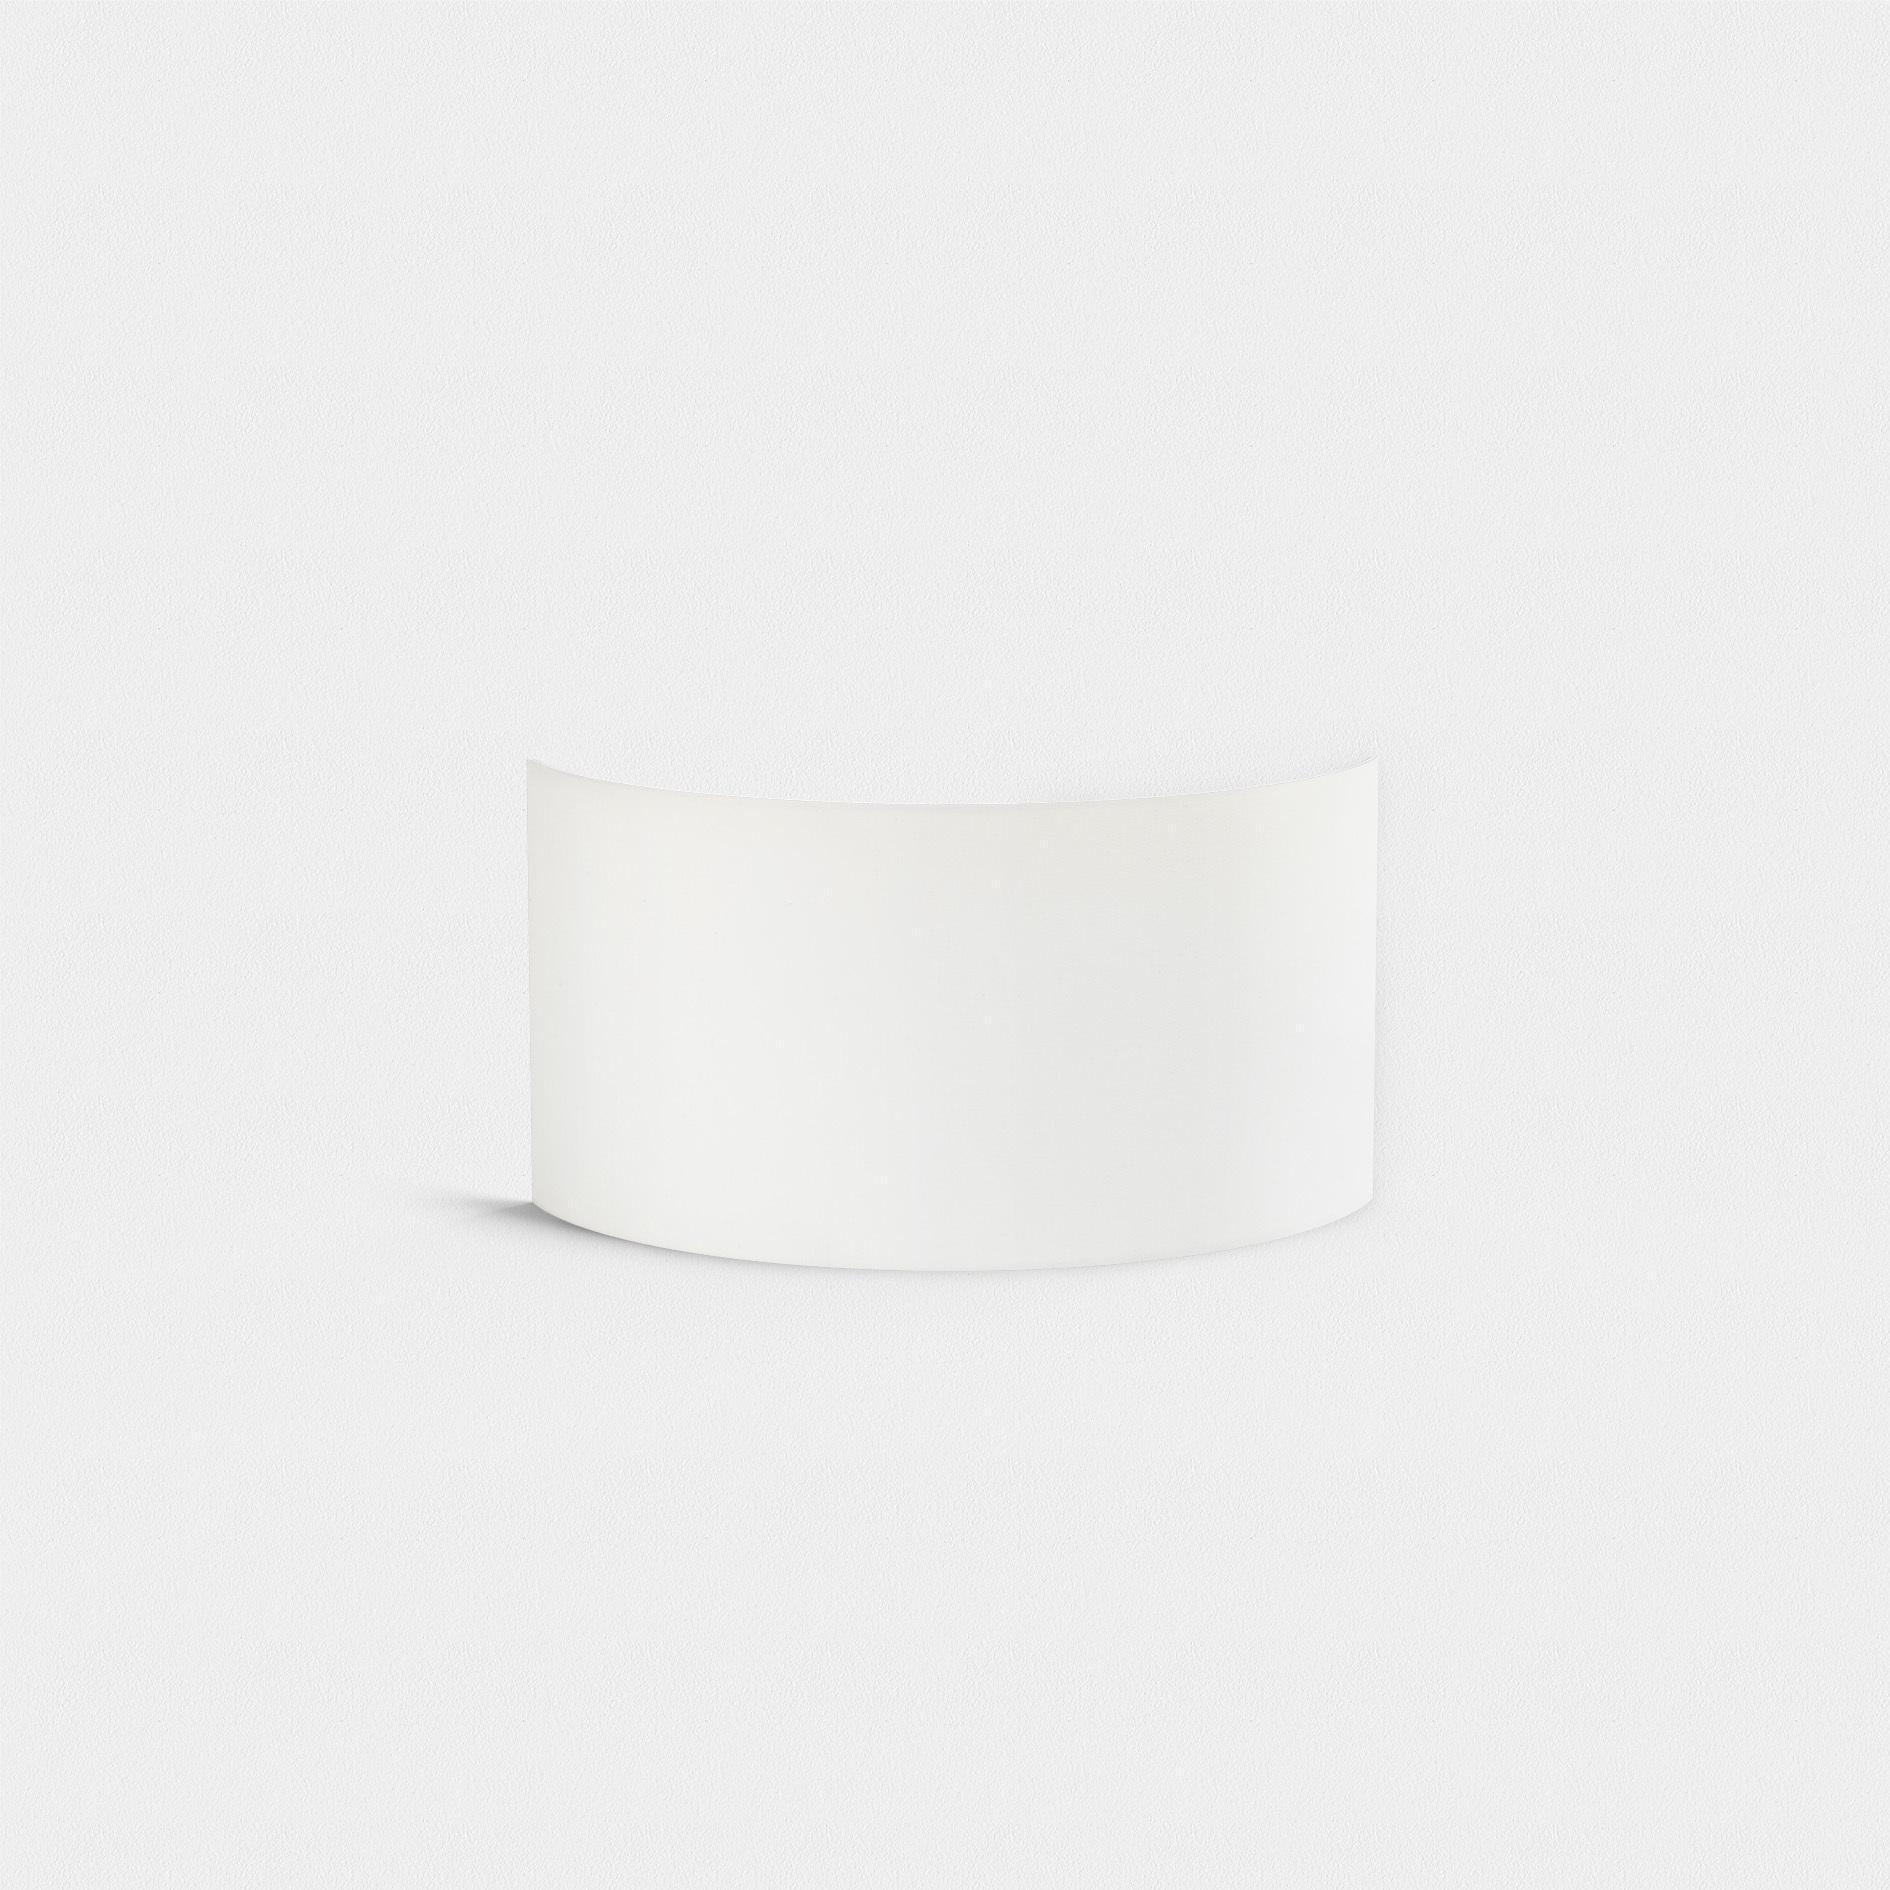 Абажур Astro Semi Drum 5026001 (4135), белый, текстиль - фото 1